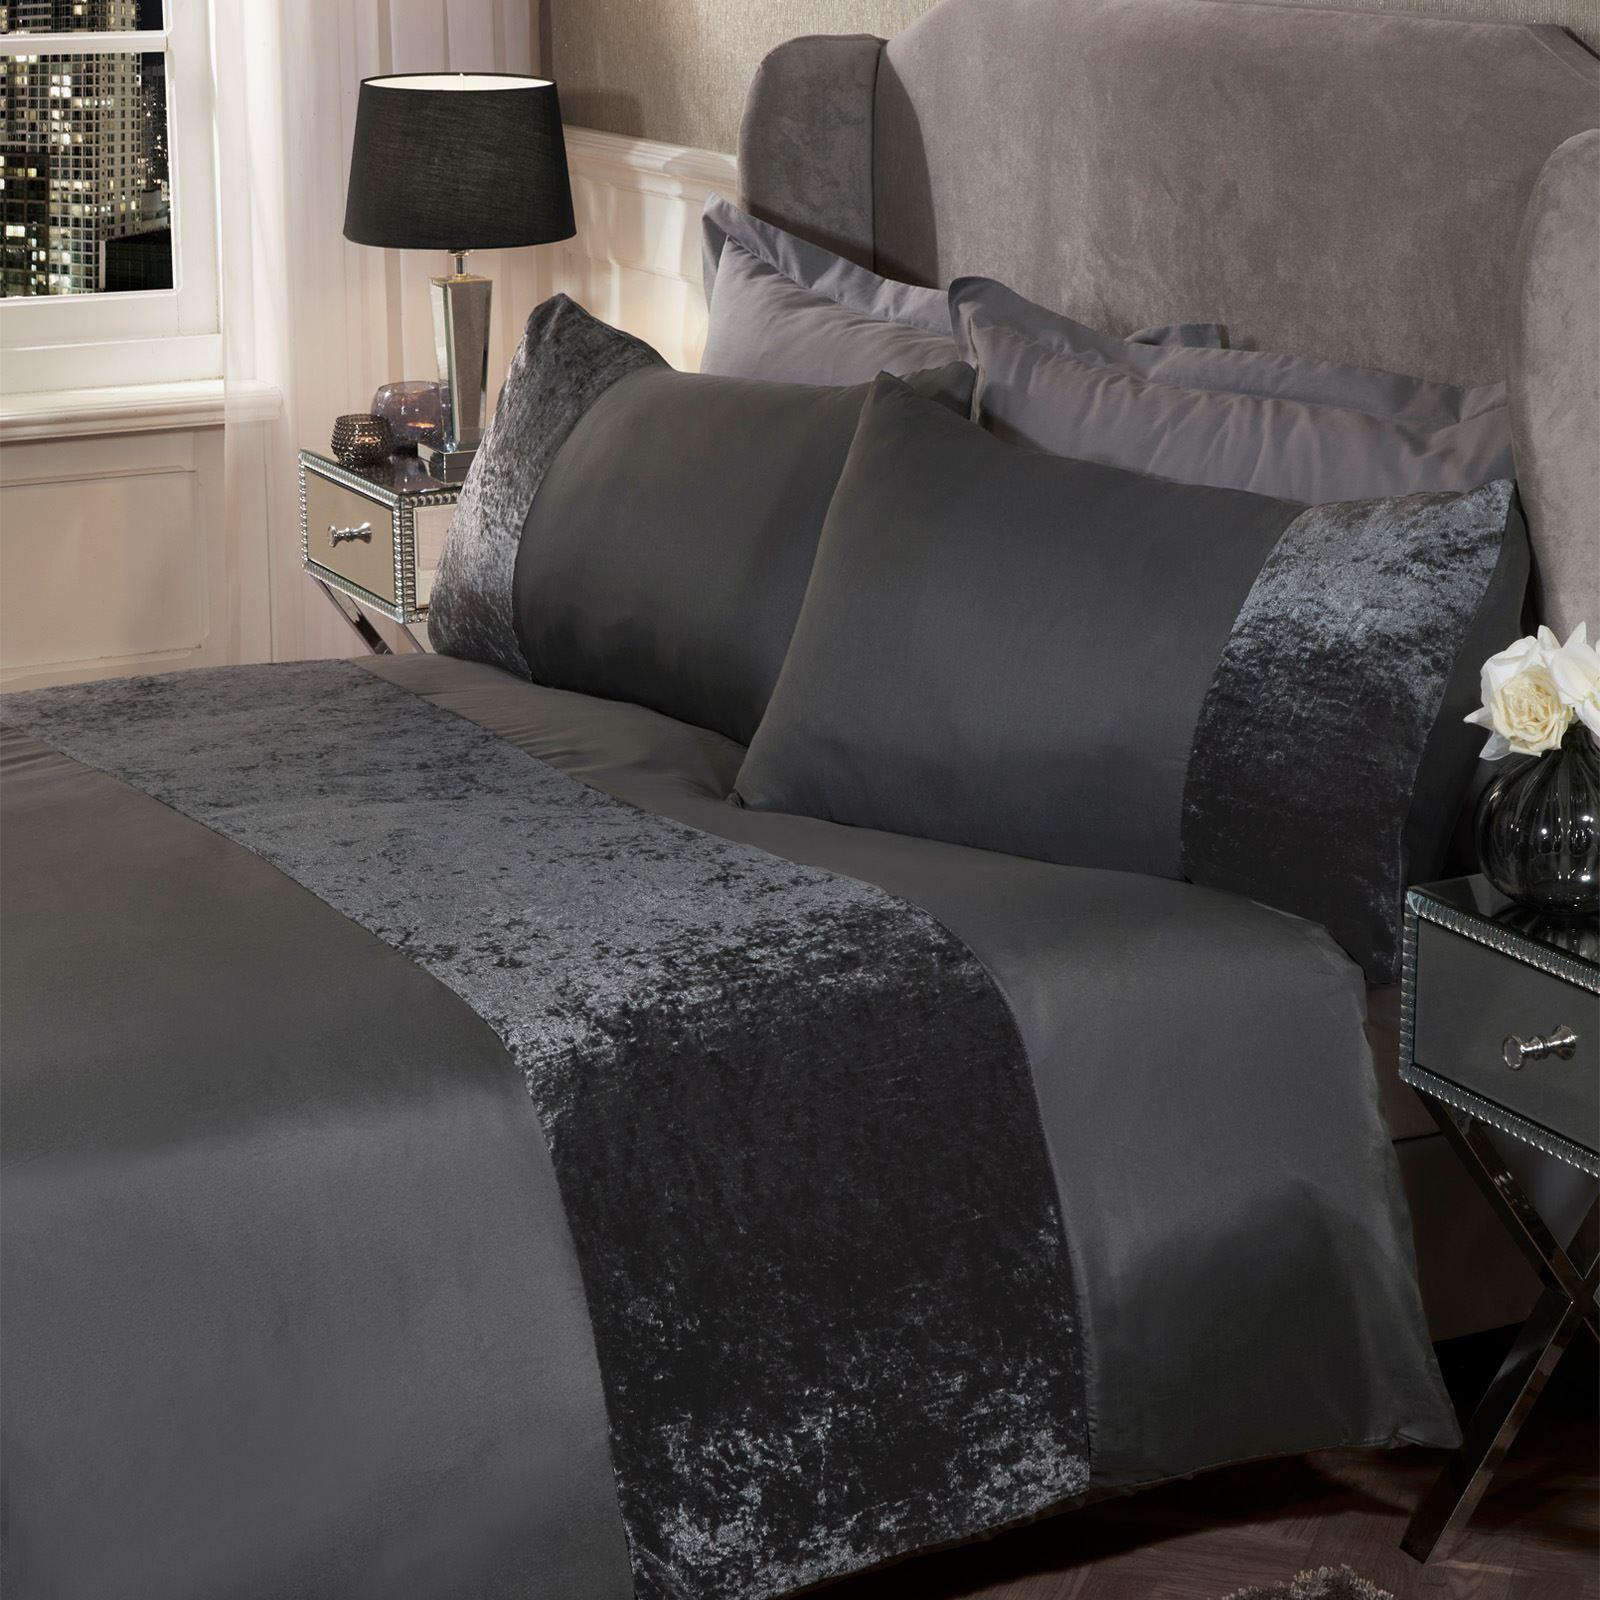 thumbnail 19 - Sienna Crushed Velvet Panel Duvet Cover with Pillow Case Bedding Set Silver Grey